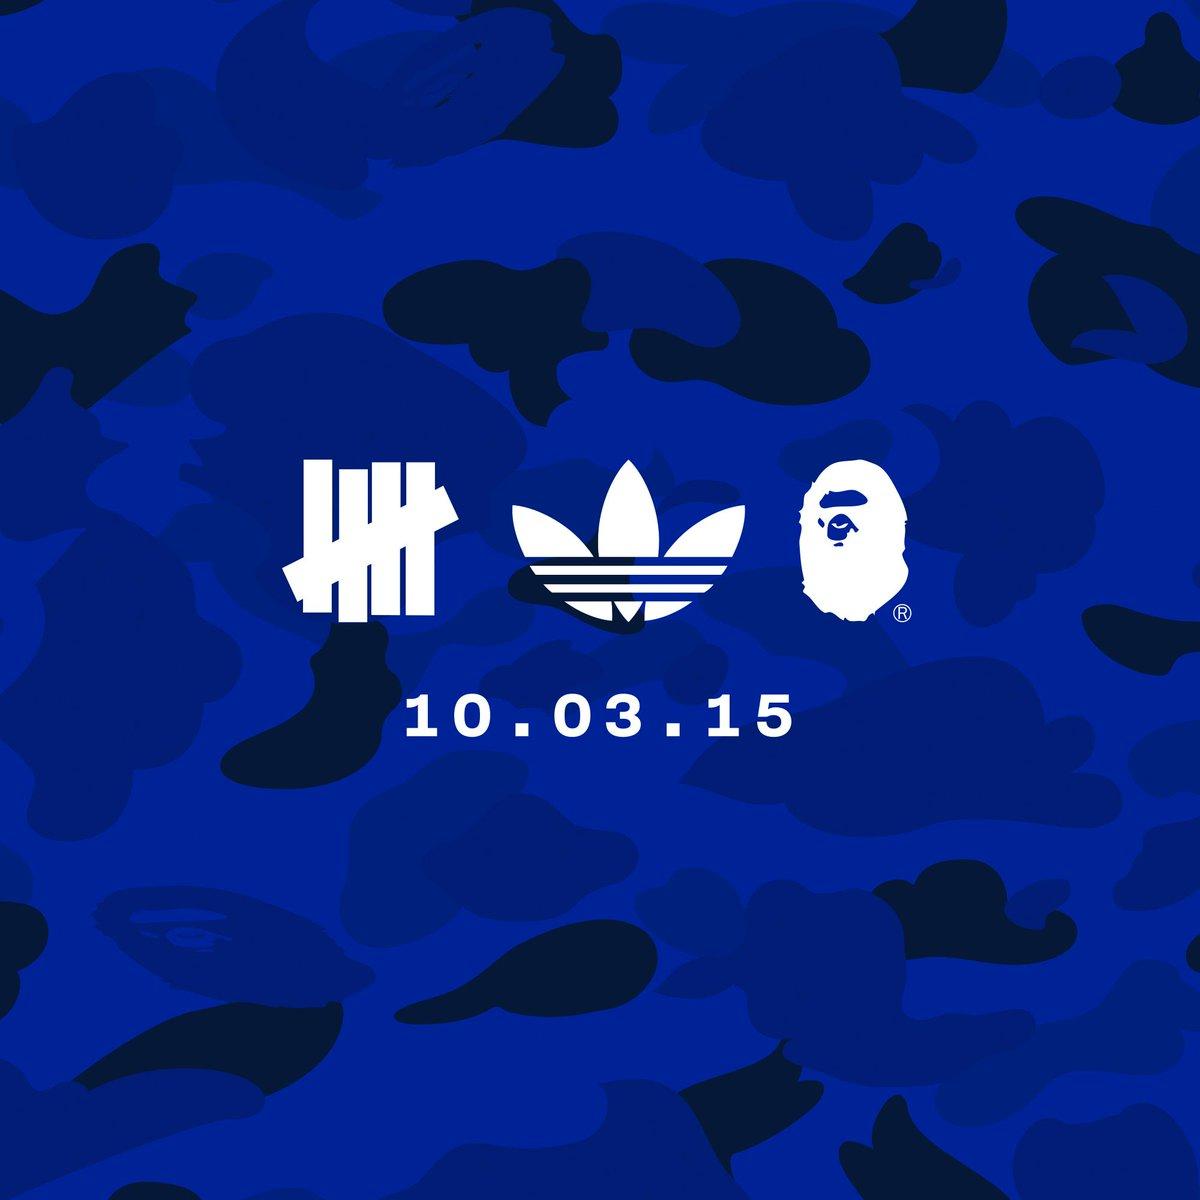 UNDEFEATED x BAPE x ADIDAS - 10.03.15 @bapeofficial @adidasoriginals http://t.co/IAHot786nG